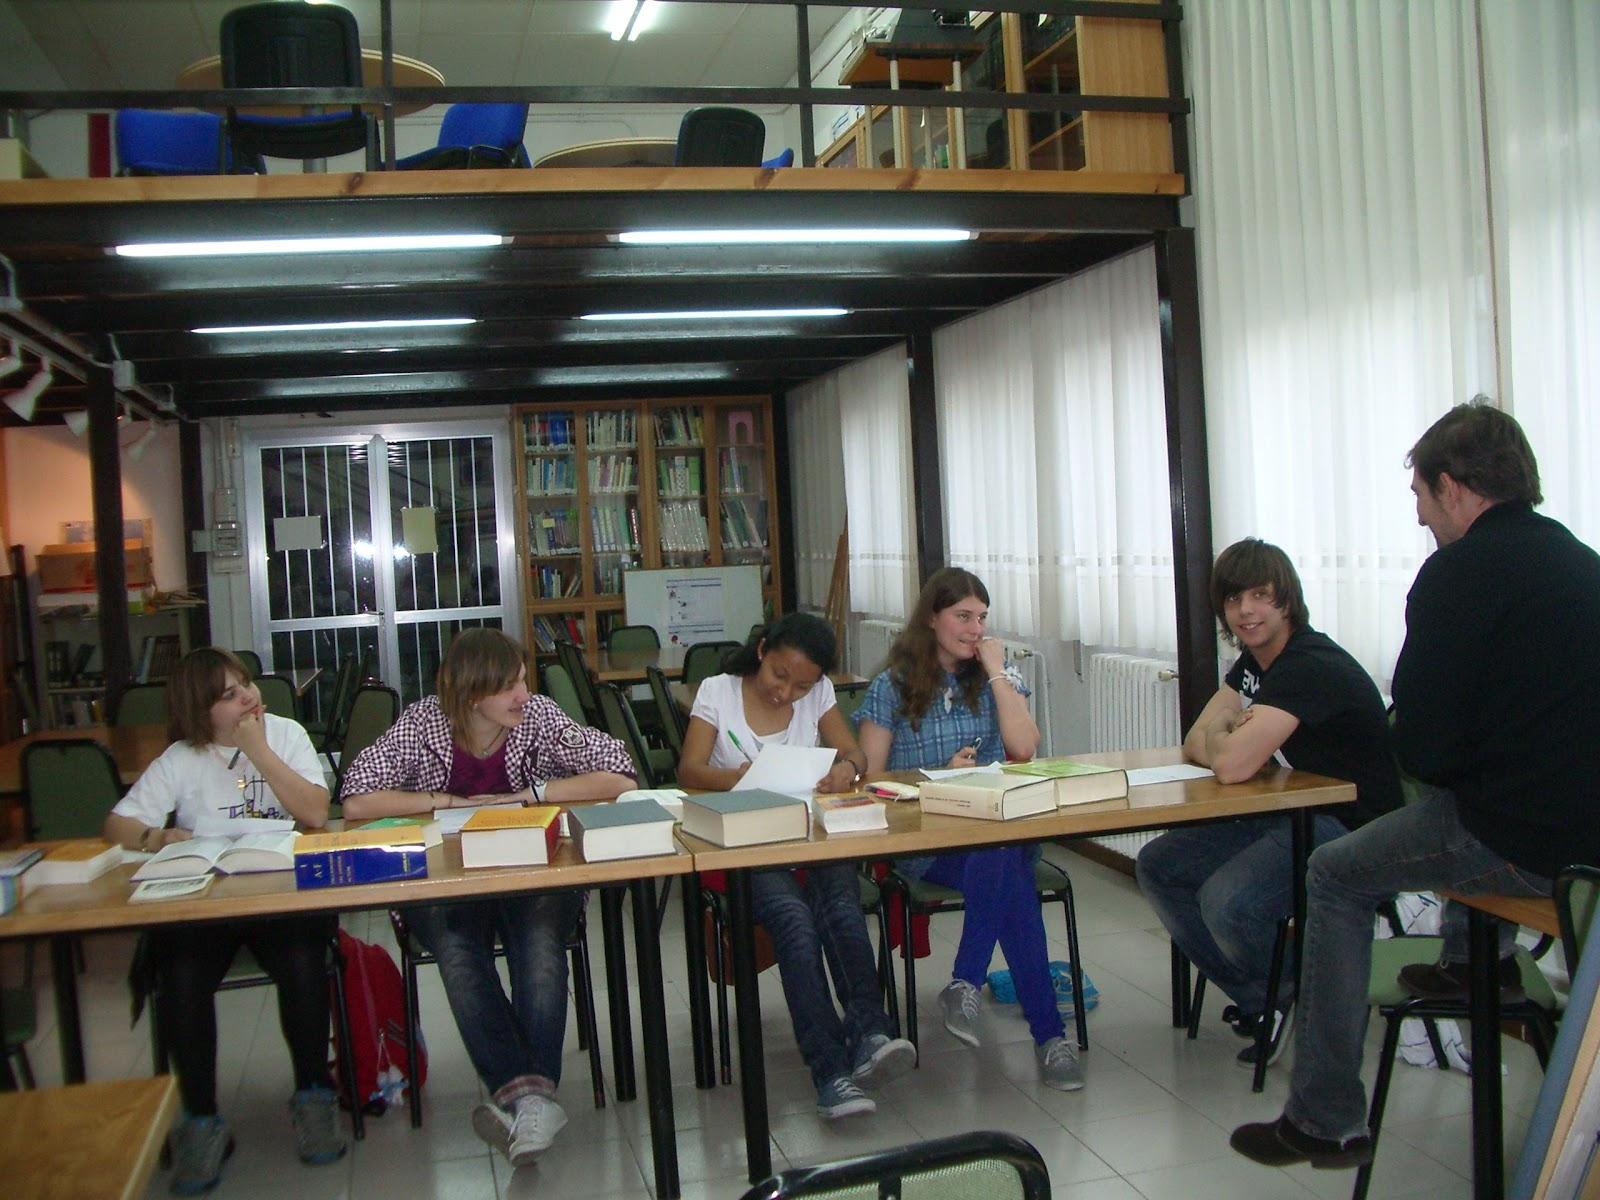 Ies pablo gargallo zaragoza taller de escritura para el - Talleres zaragoza ...